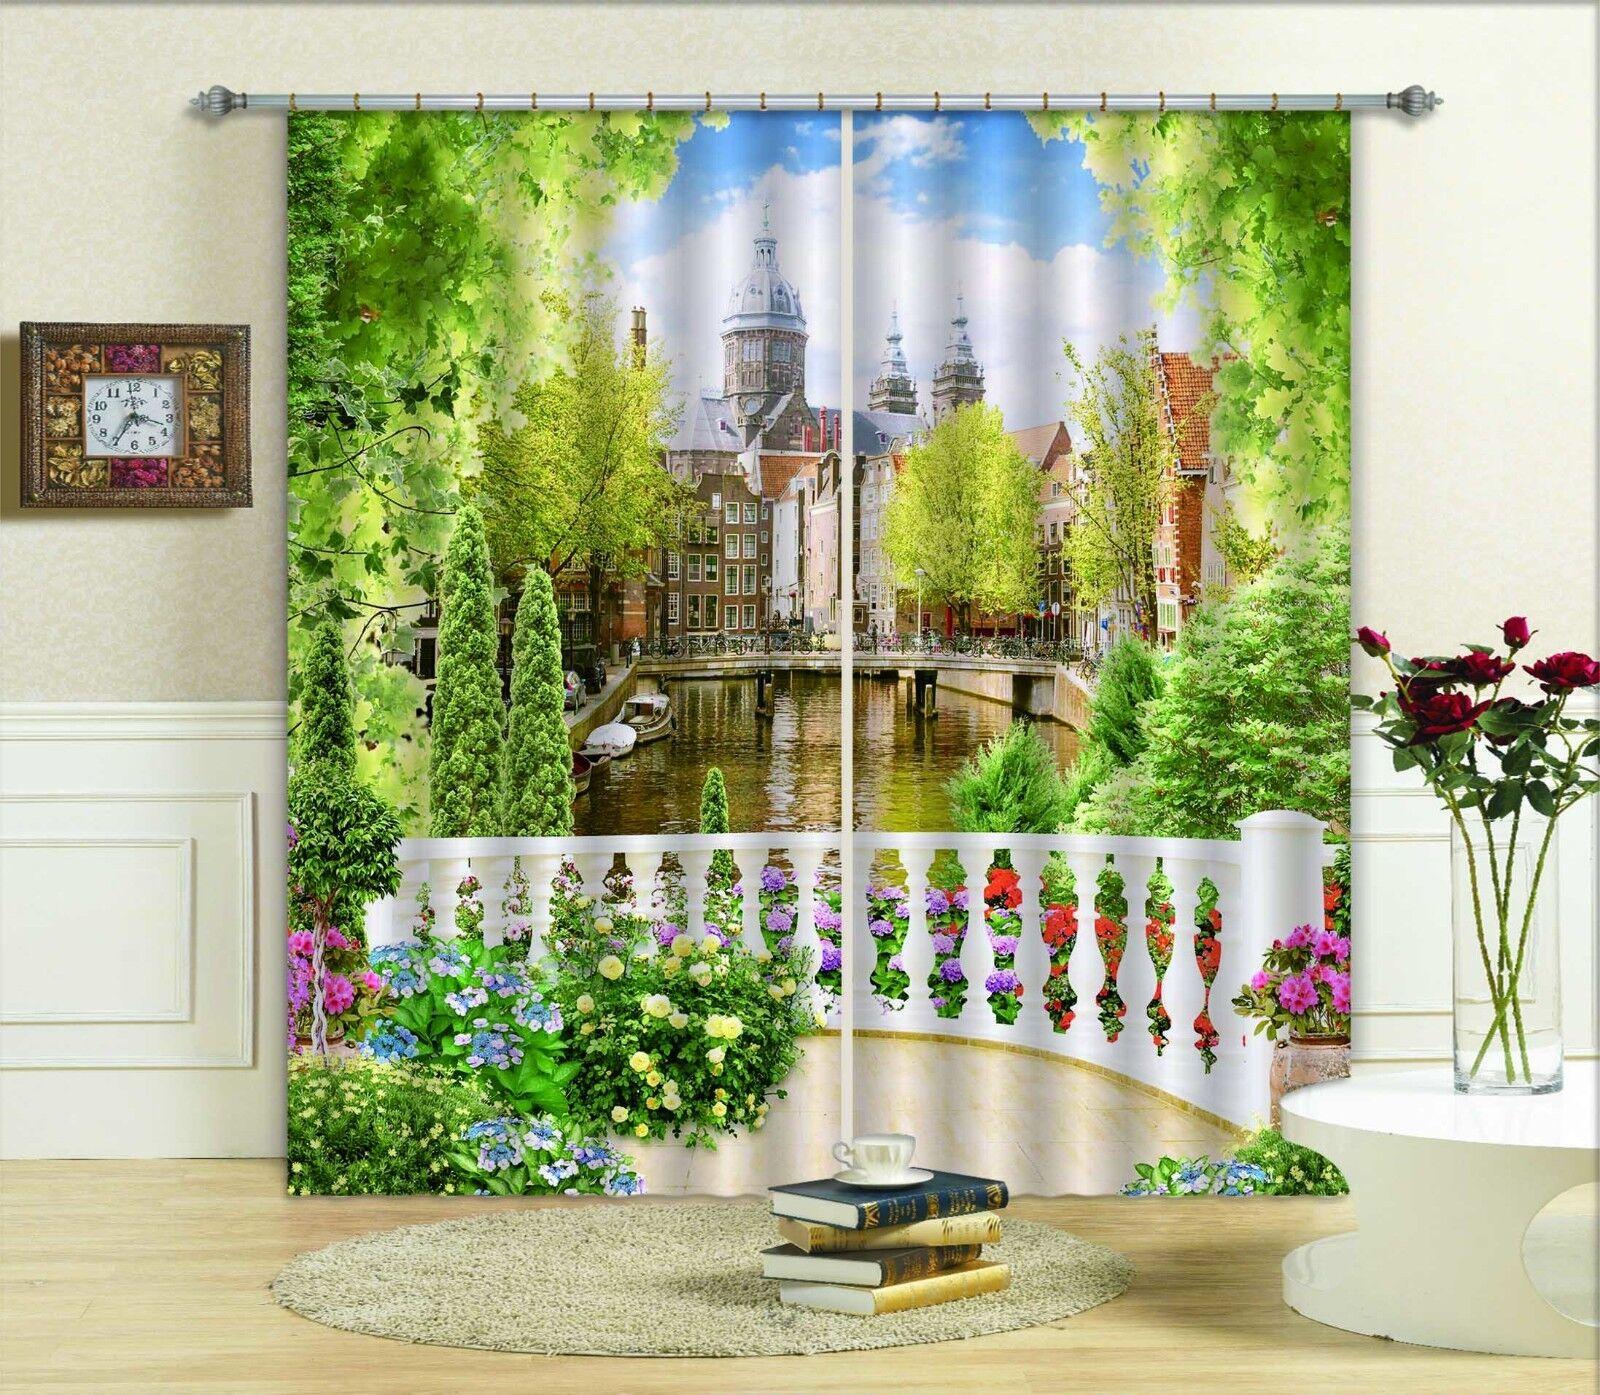 3D árbol Palacio 8 Cortinas de impresión de cortina de foto Blockout Tela Cortinas Ventana au